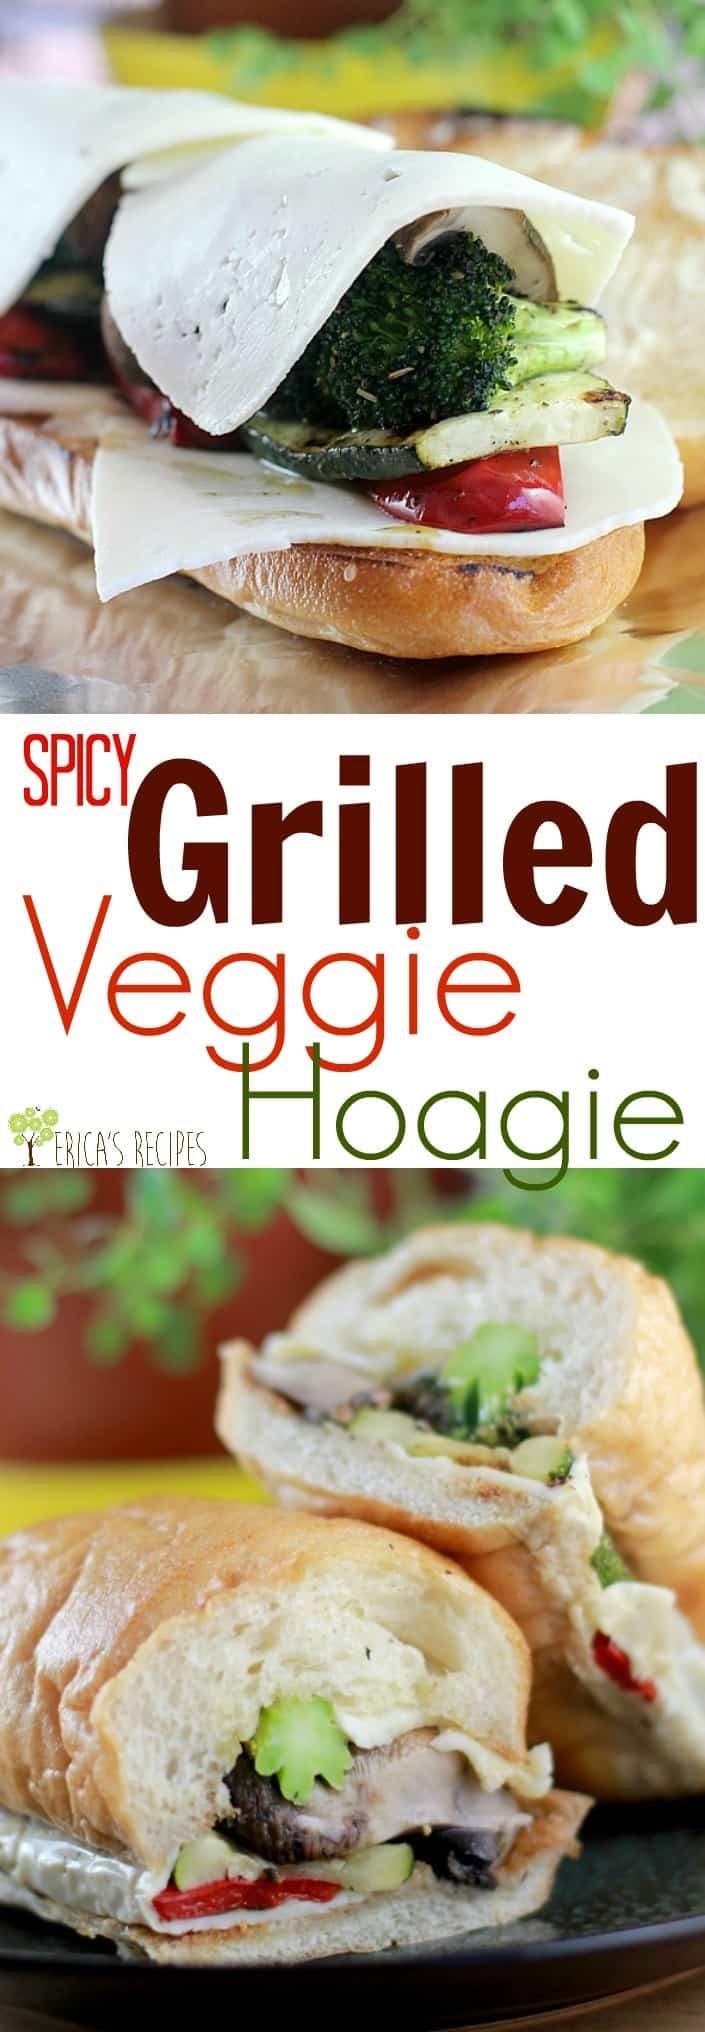 Spicy Grilled Veggie Hoagies #KingofFlavor #FlavorRocksTG #ad